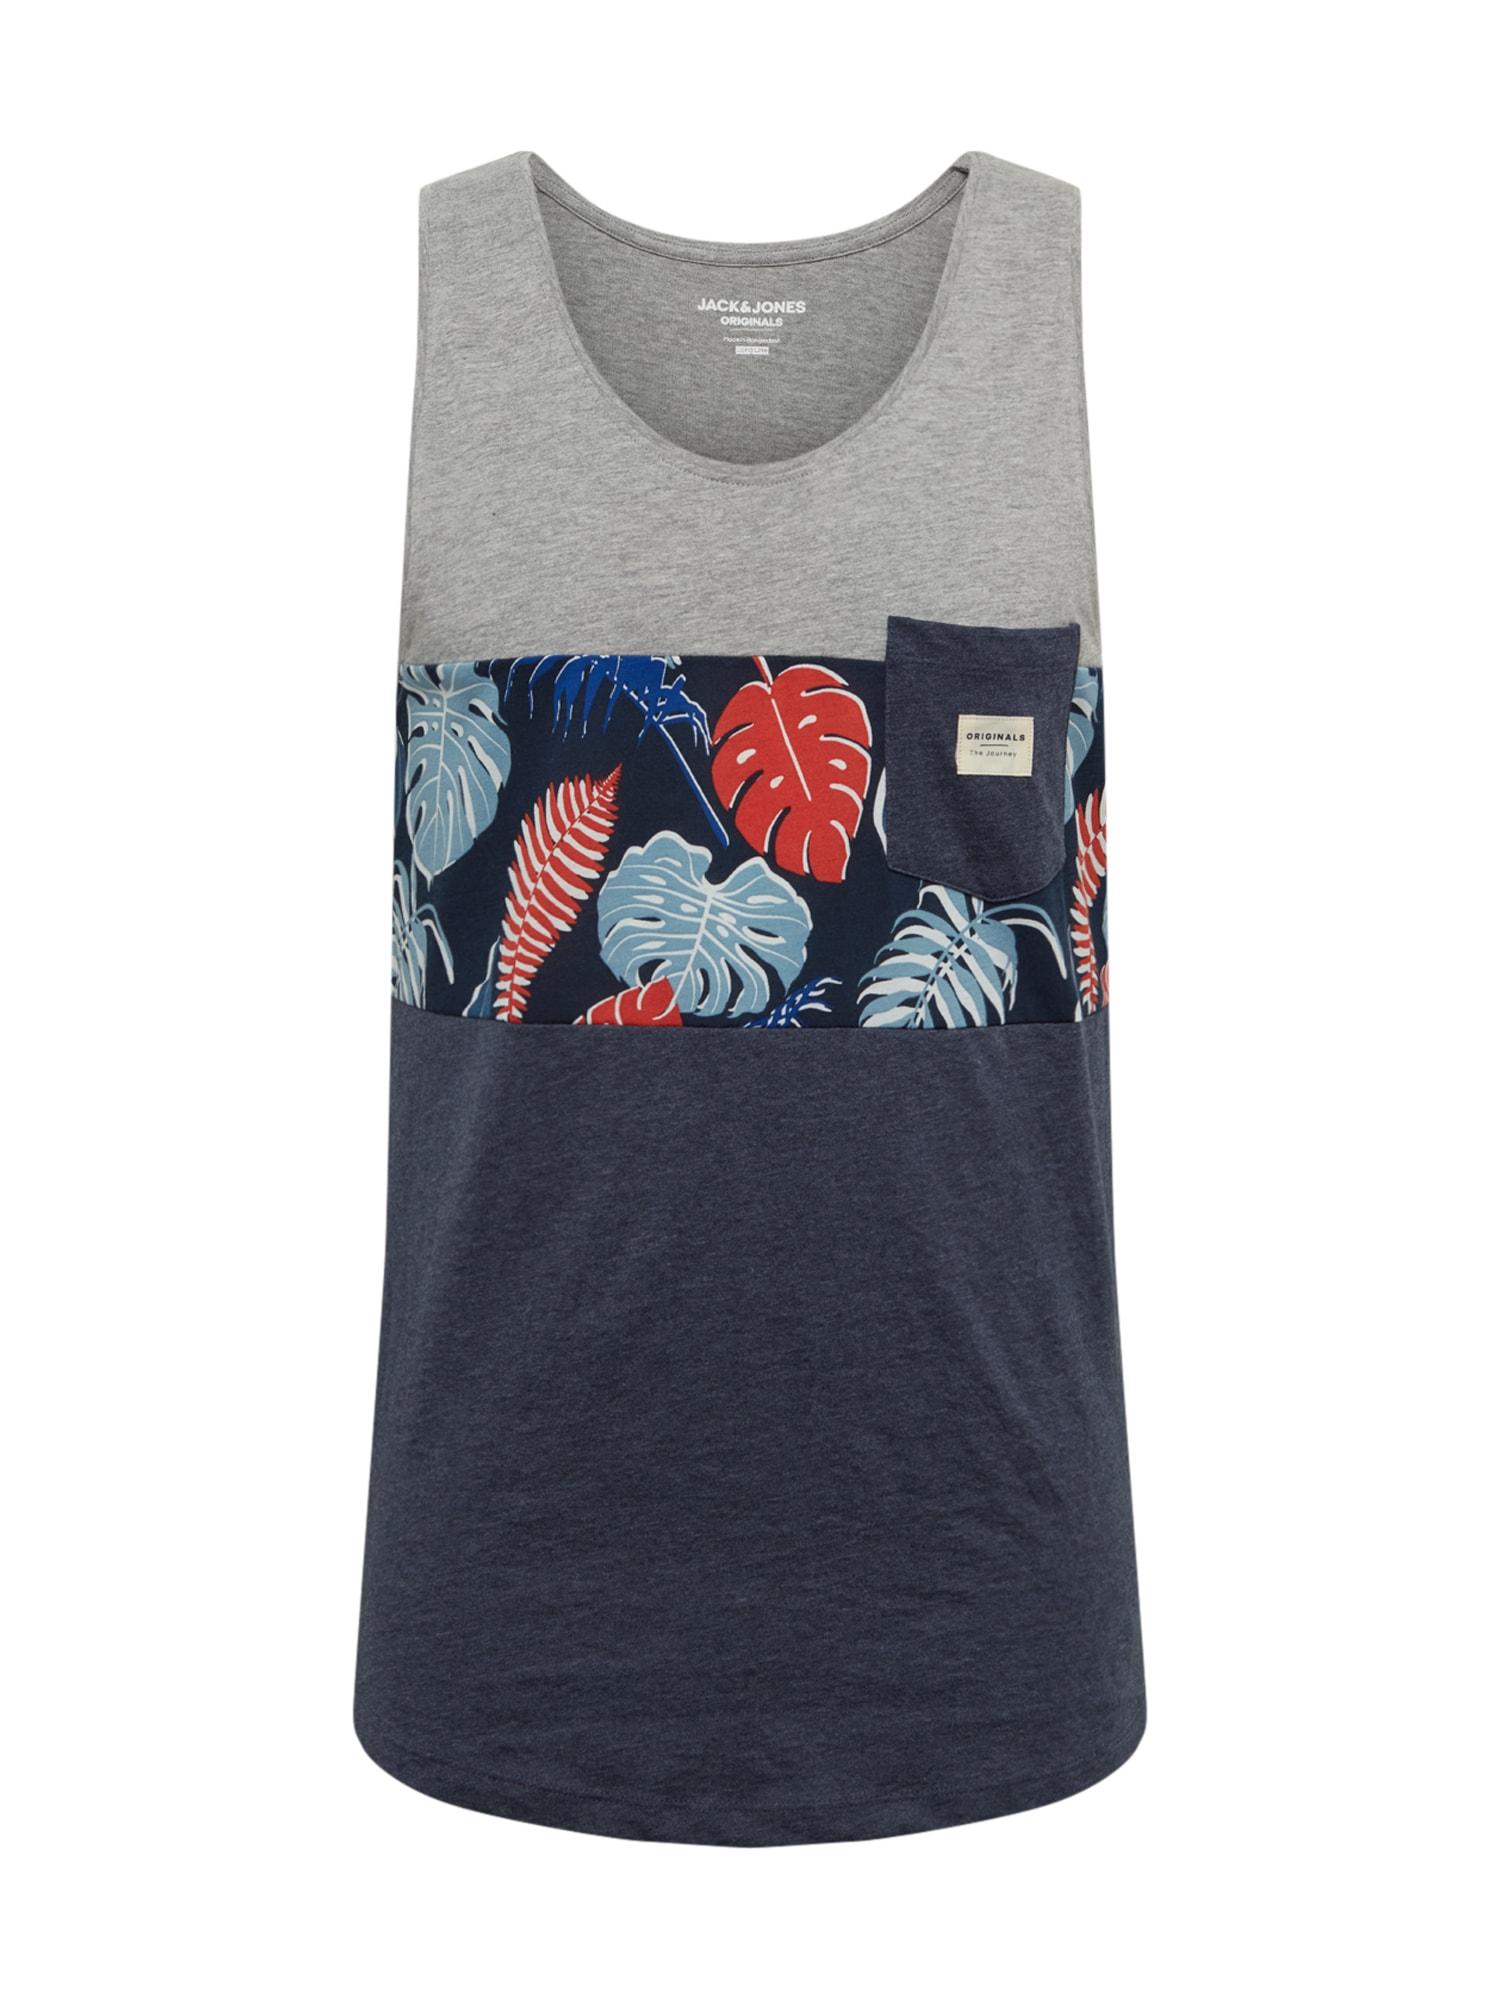 JACK & JONES Marškinėliai 'Flame' pilka